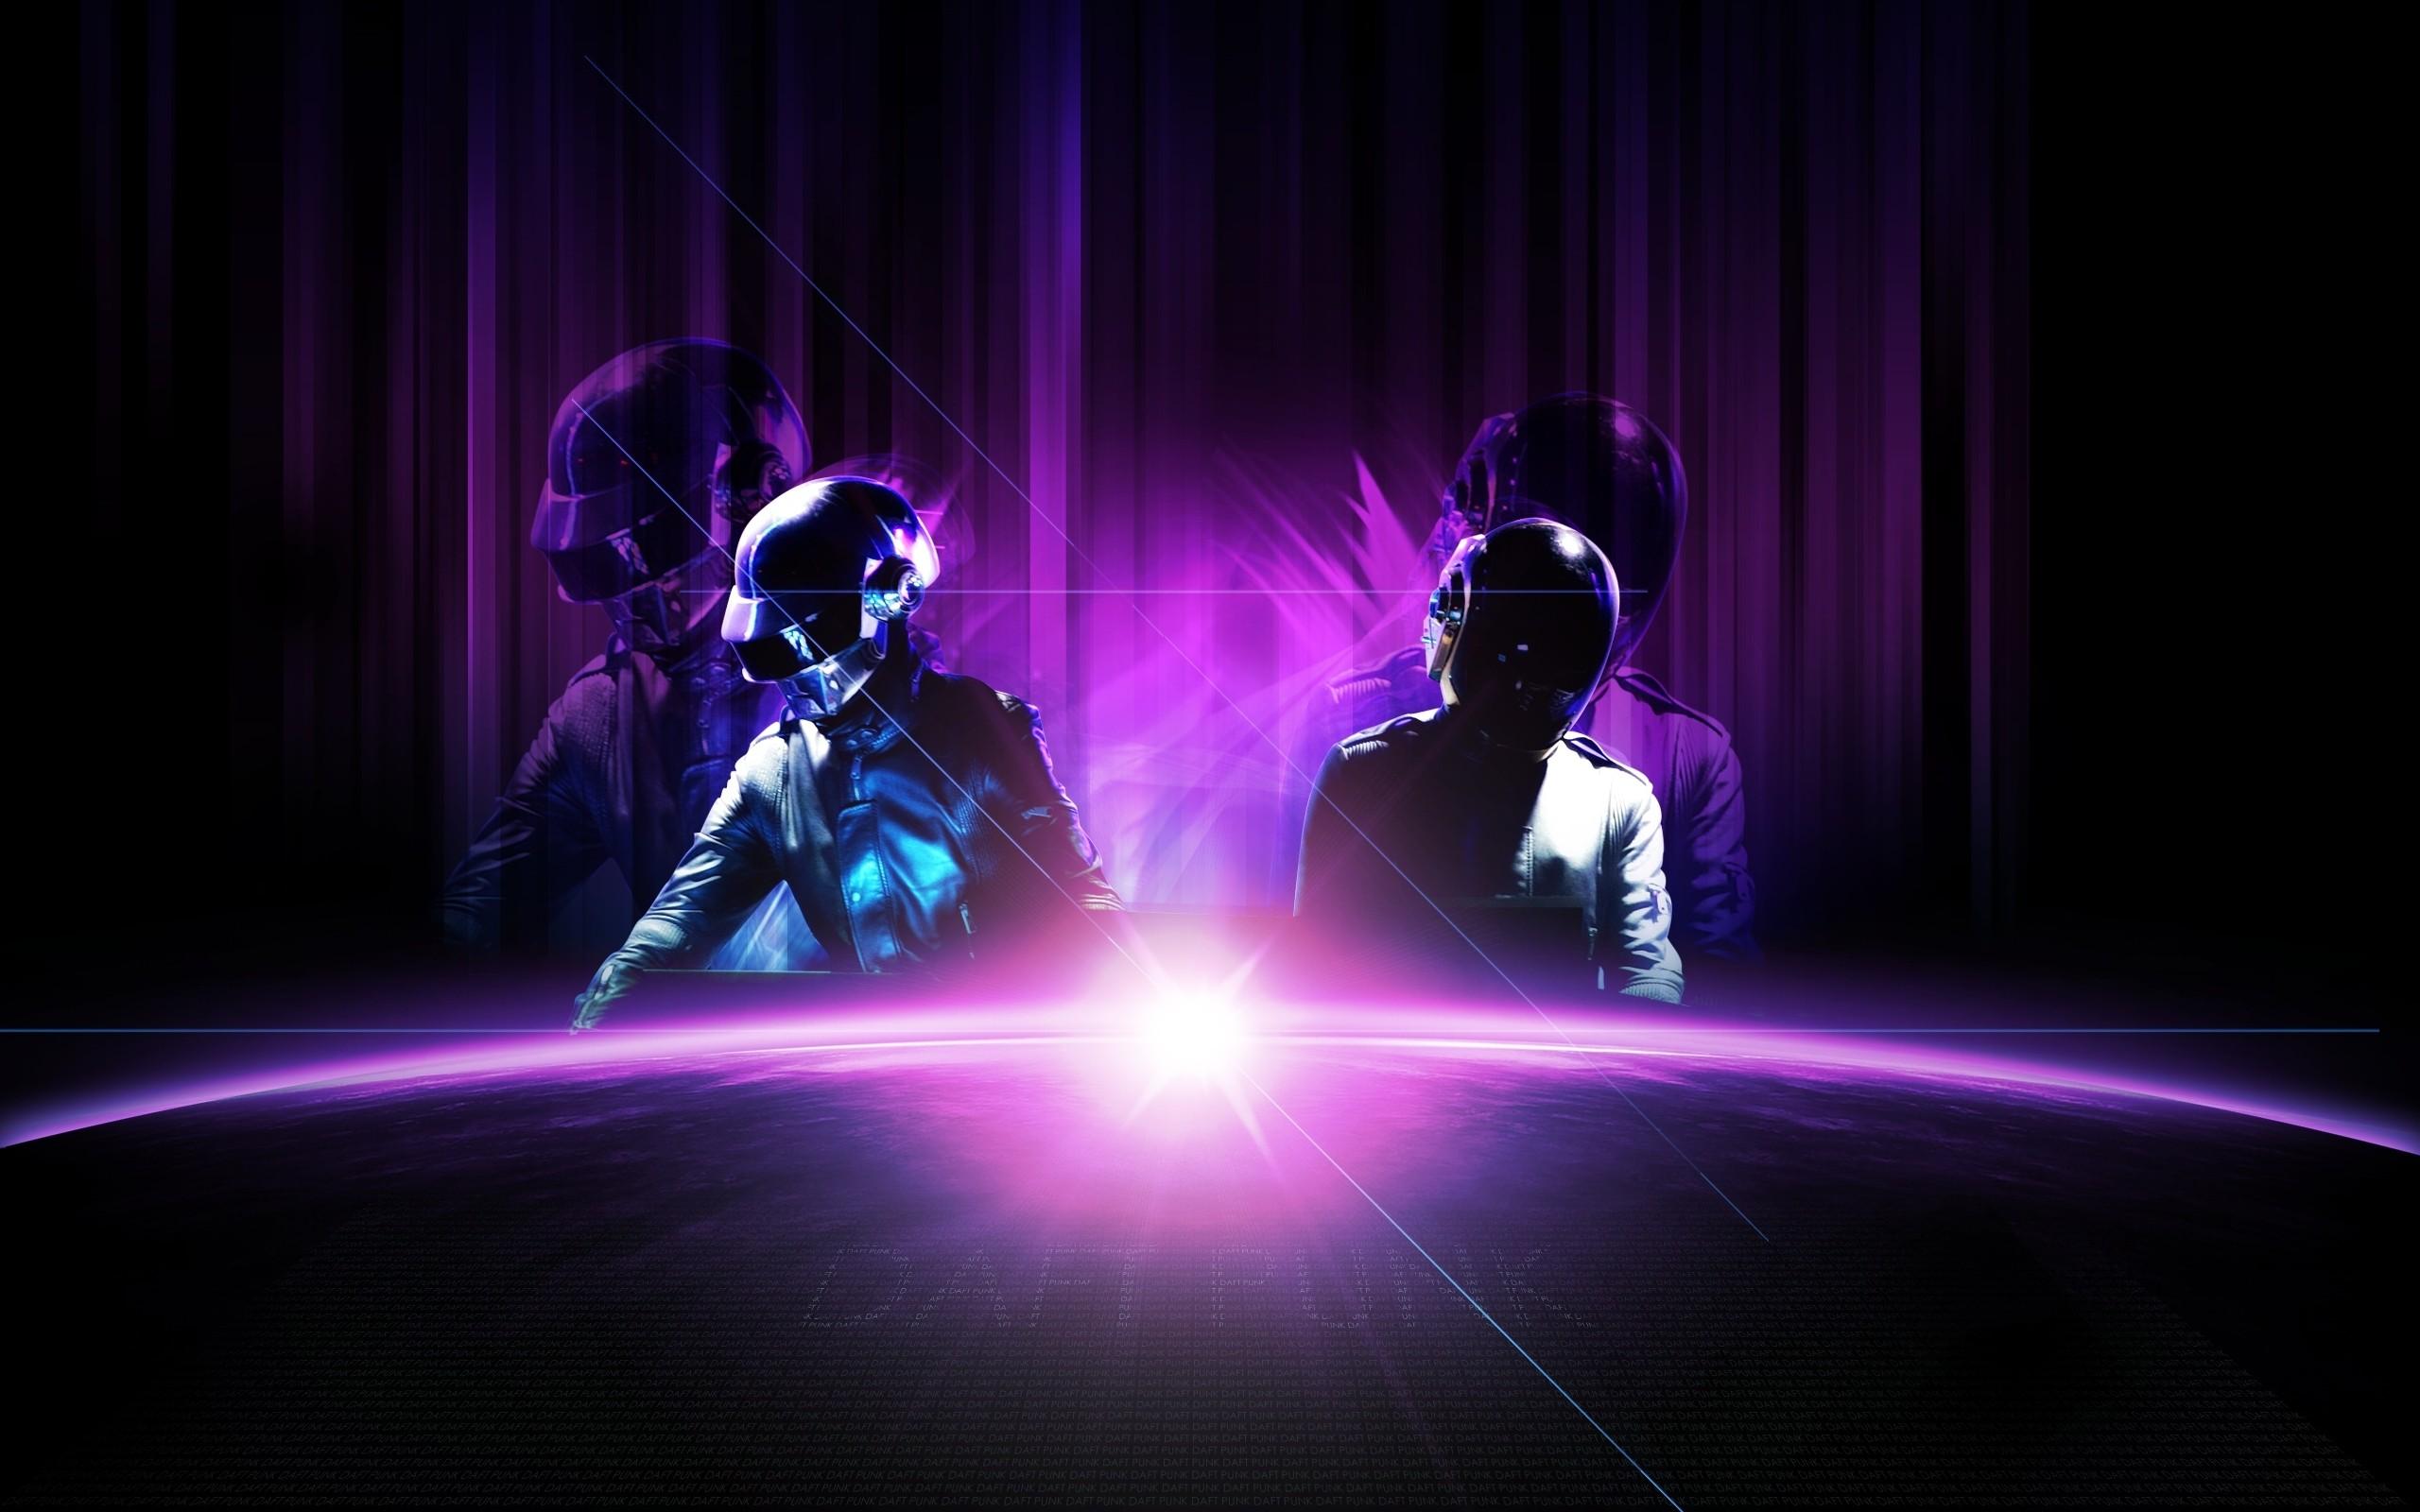 General 2560x1600 music Daft Punk purple electronic music digital art planet Daft Punk #epilogue